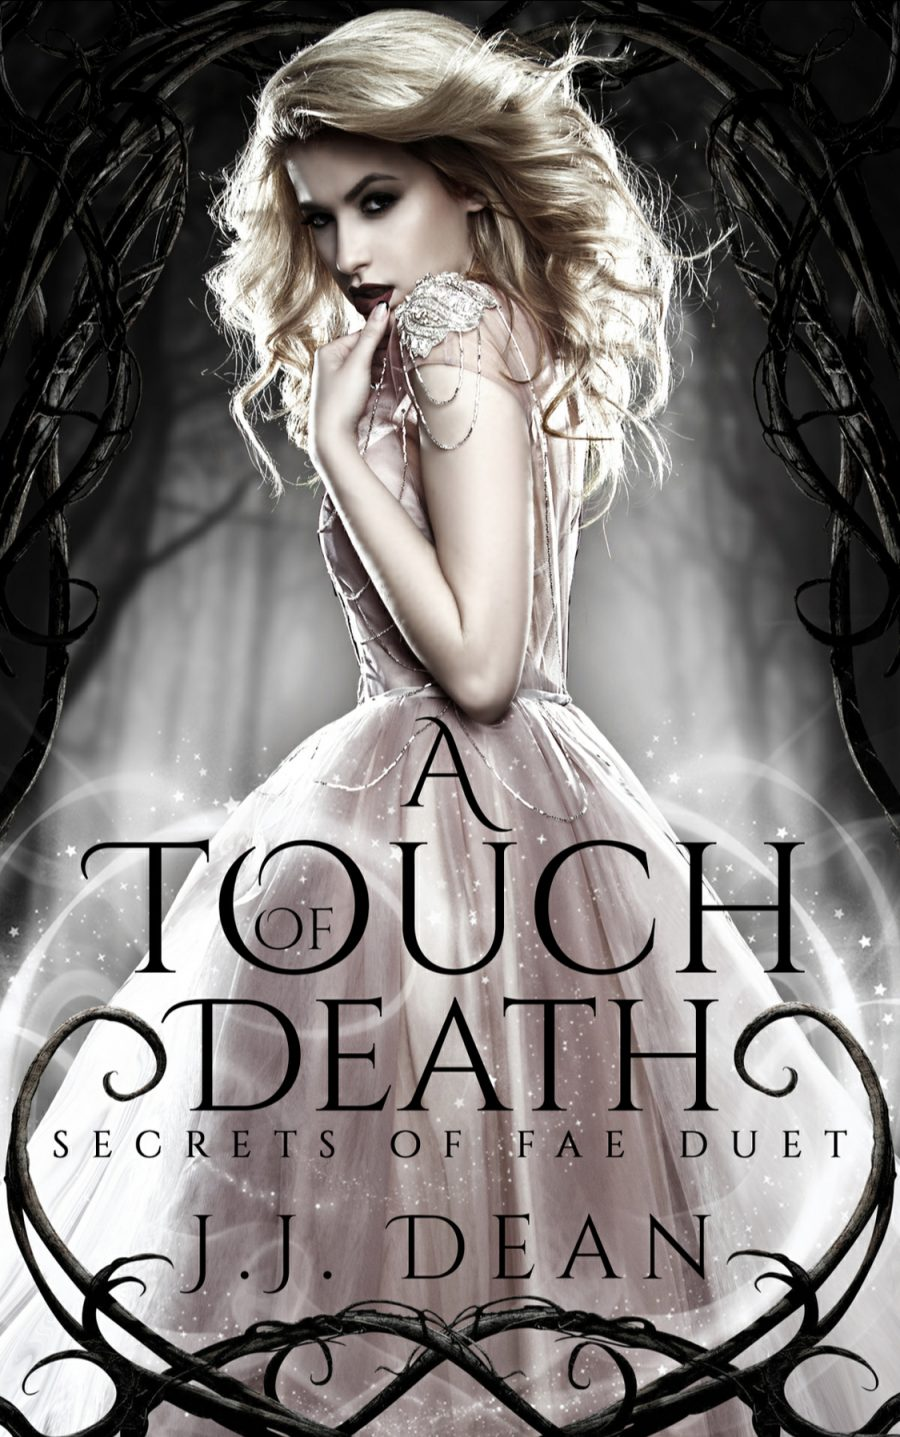 A Touch of Death by J.J. Dean - A Book Review #BookReview #SlowBurn #RH #Duet #PNR #WhyChoose #ReverseHarem #4Stars #KindleUnlimited #KU